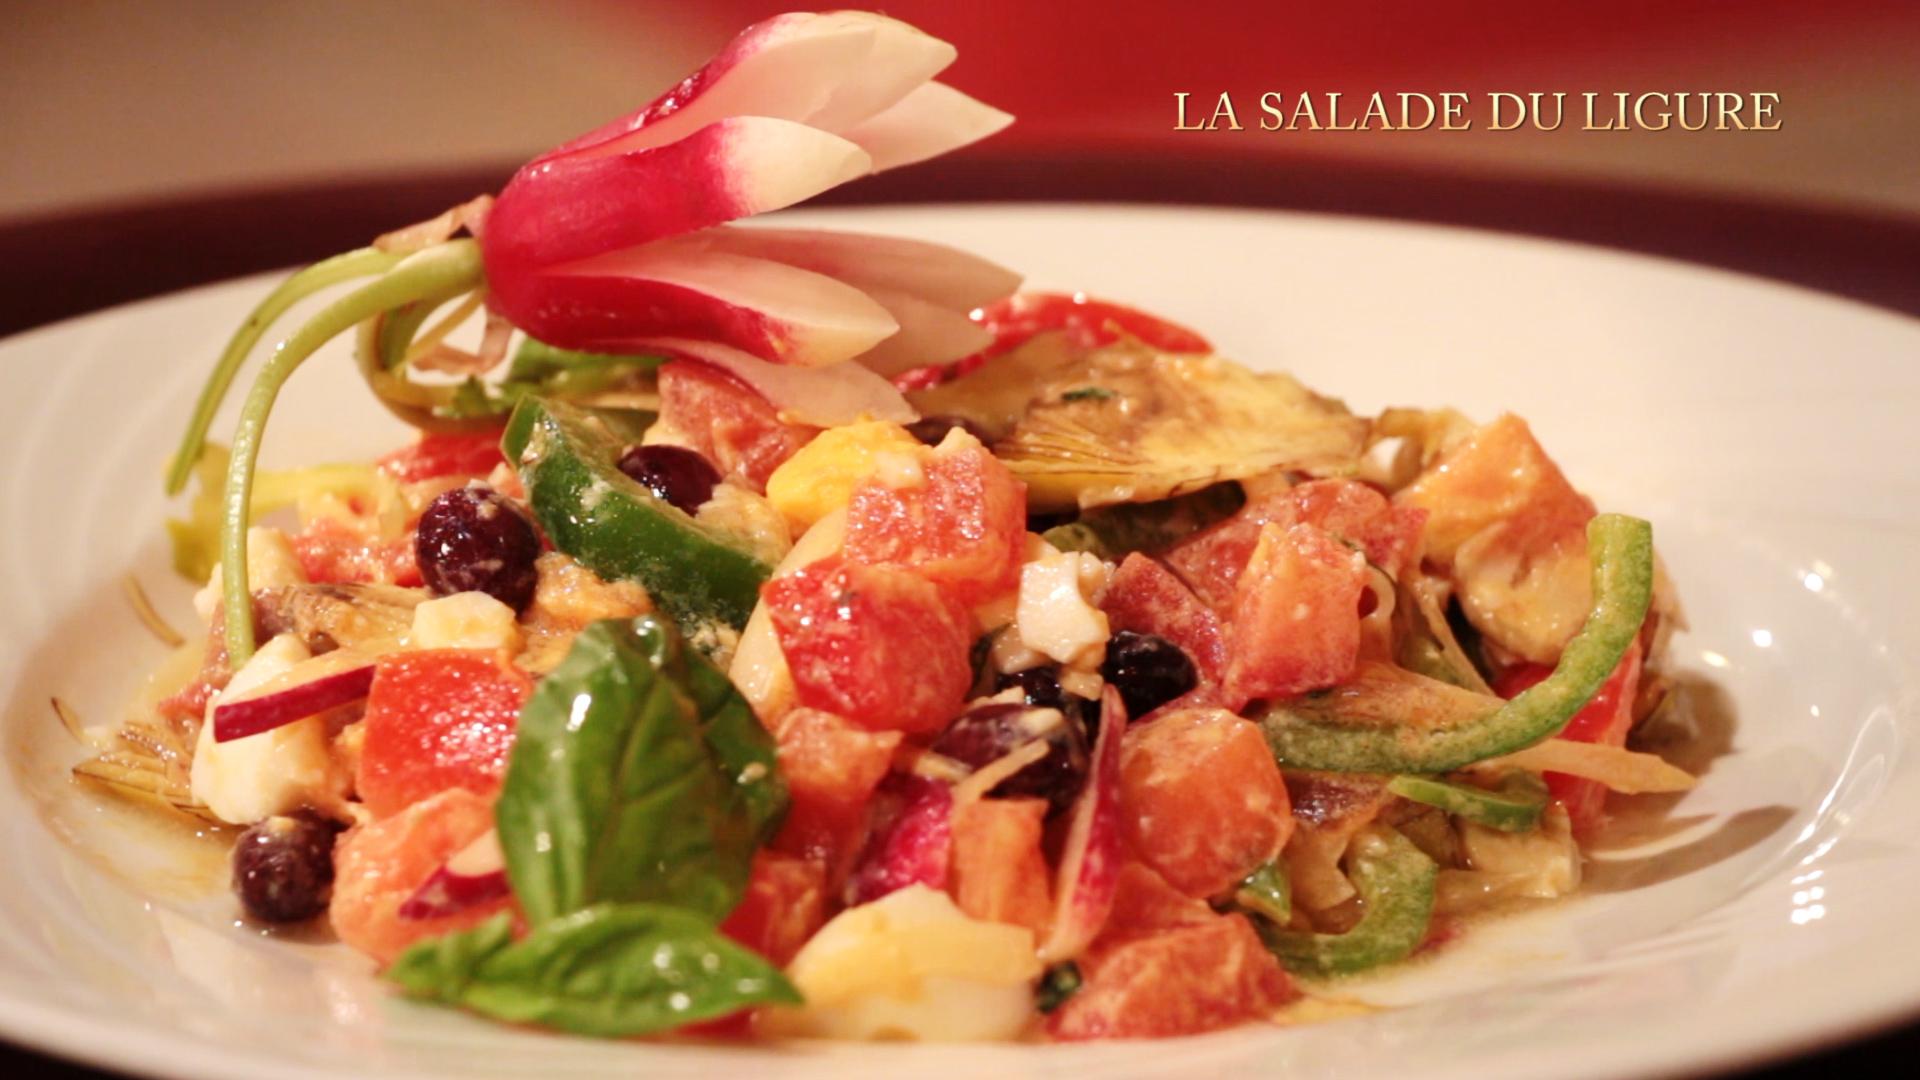 La Salade Niçoise du Ligure